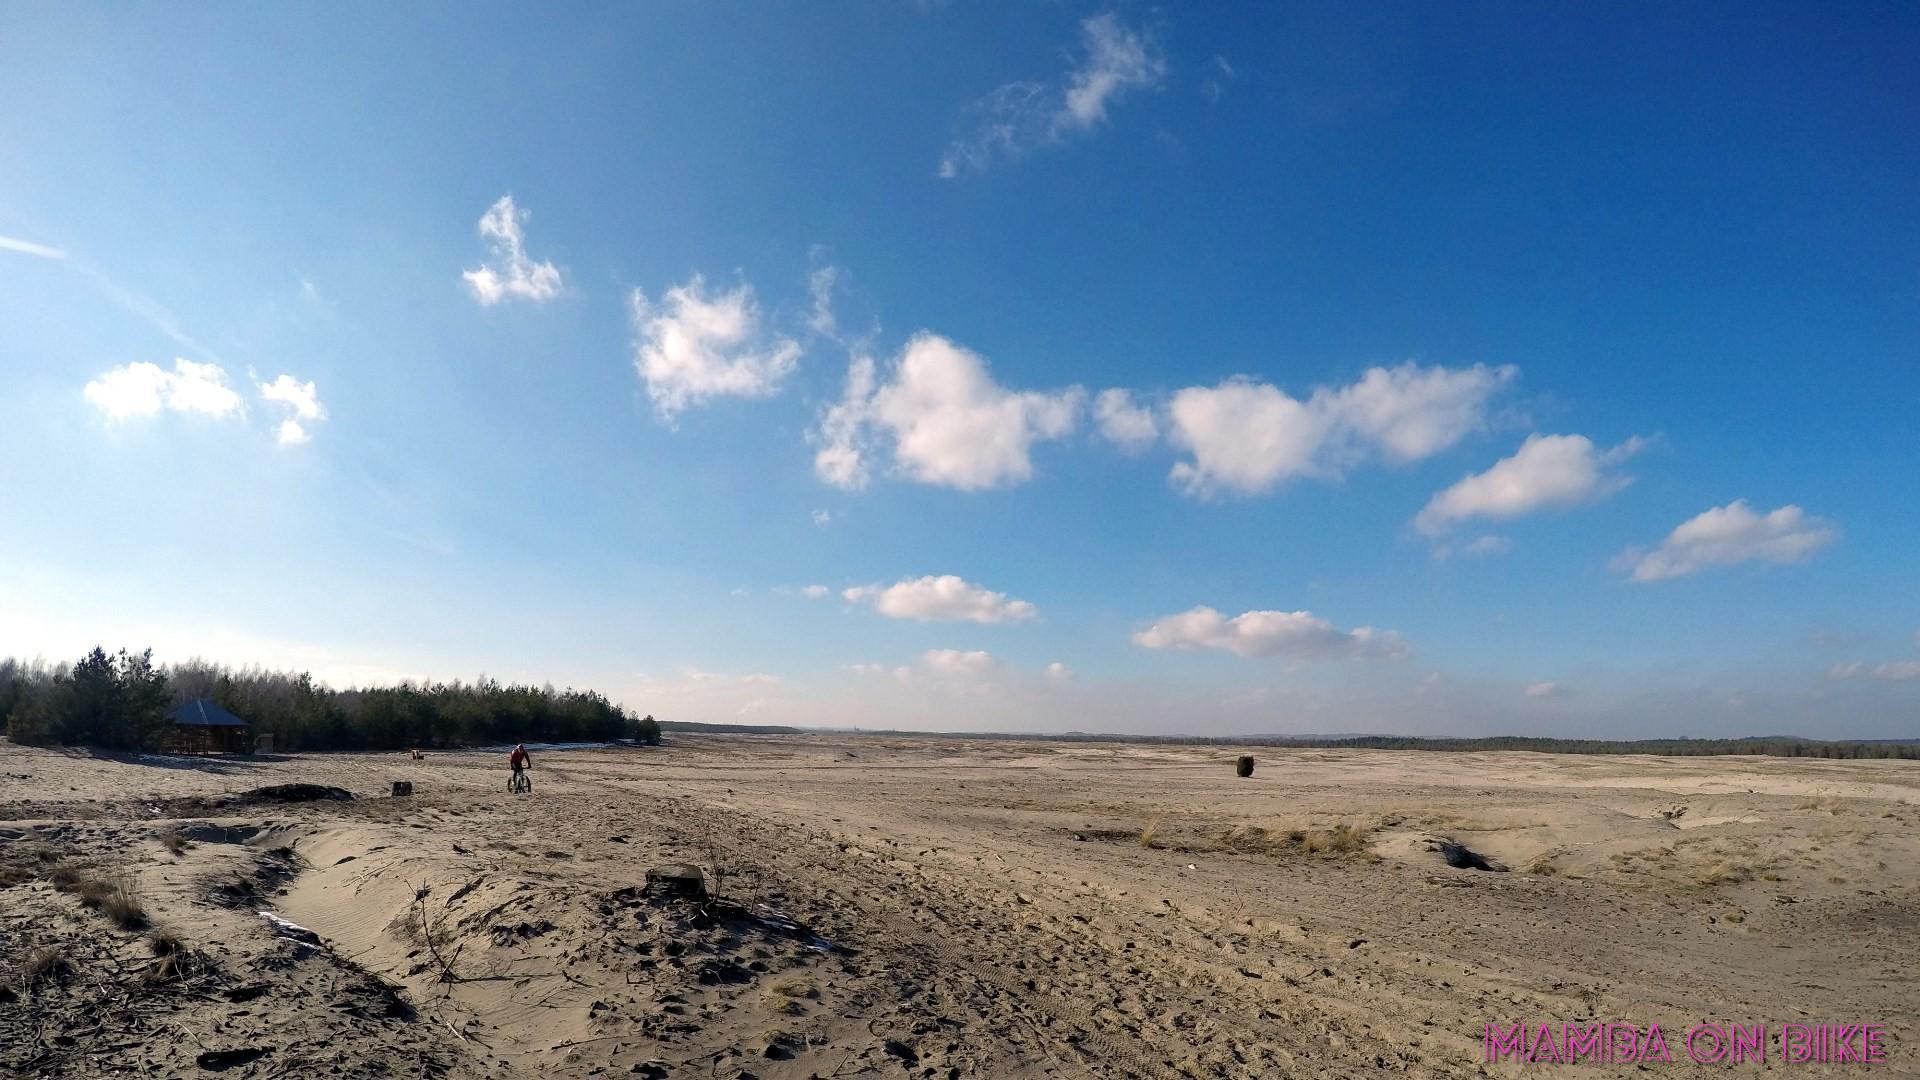 rowerem po pustyni